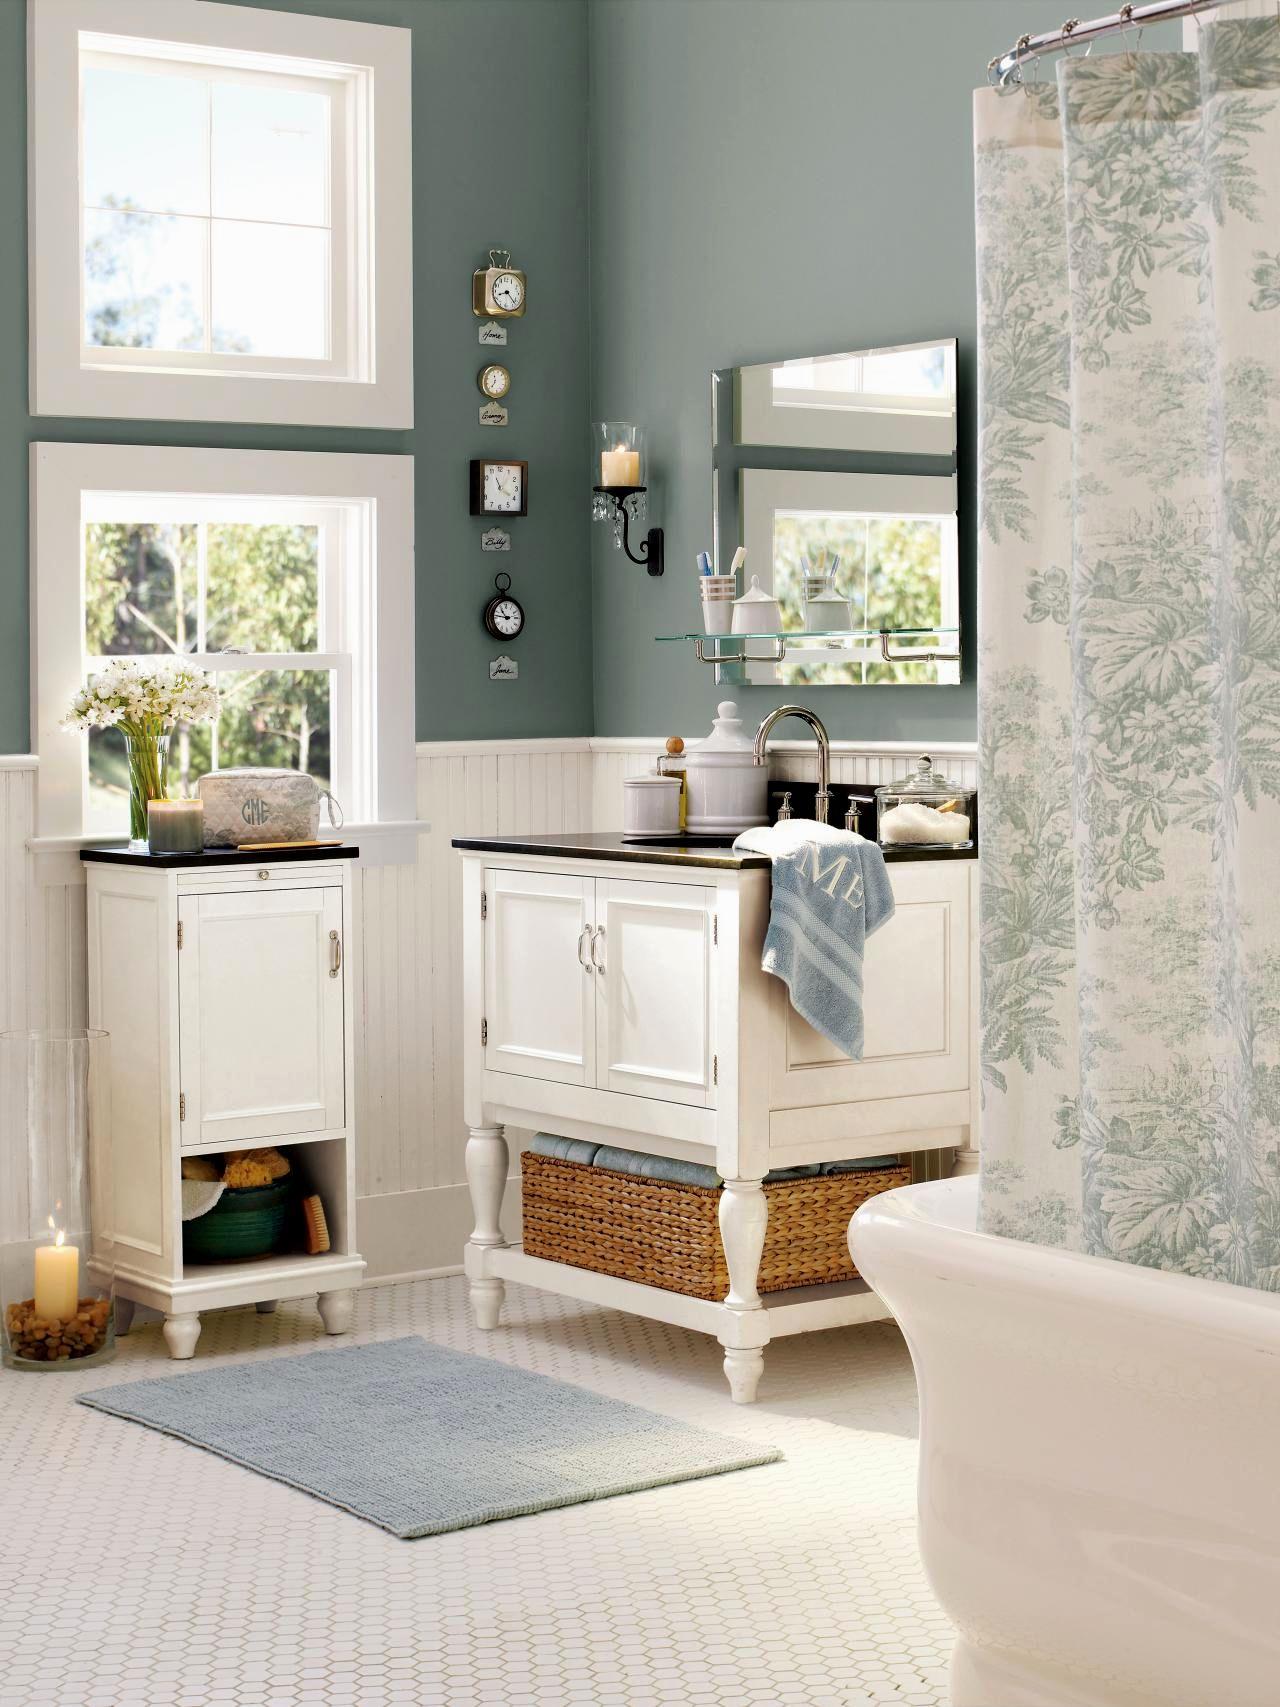 fresh pottery barn bathroom design-Amazing Pottery Barn Bathroom Layout